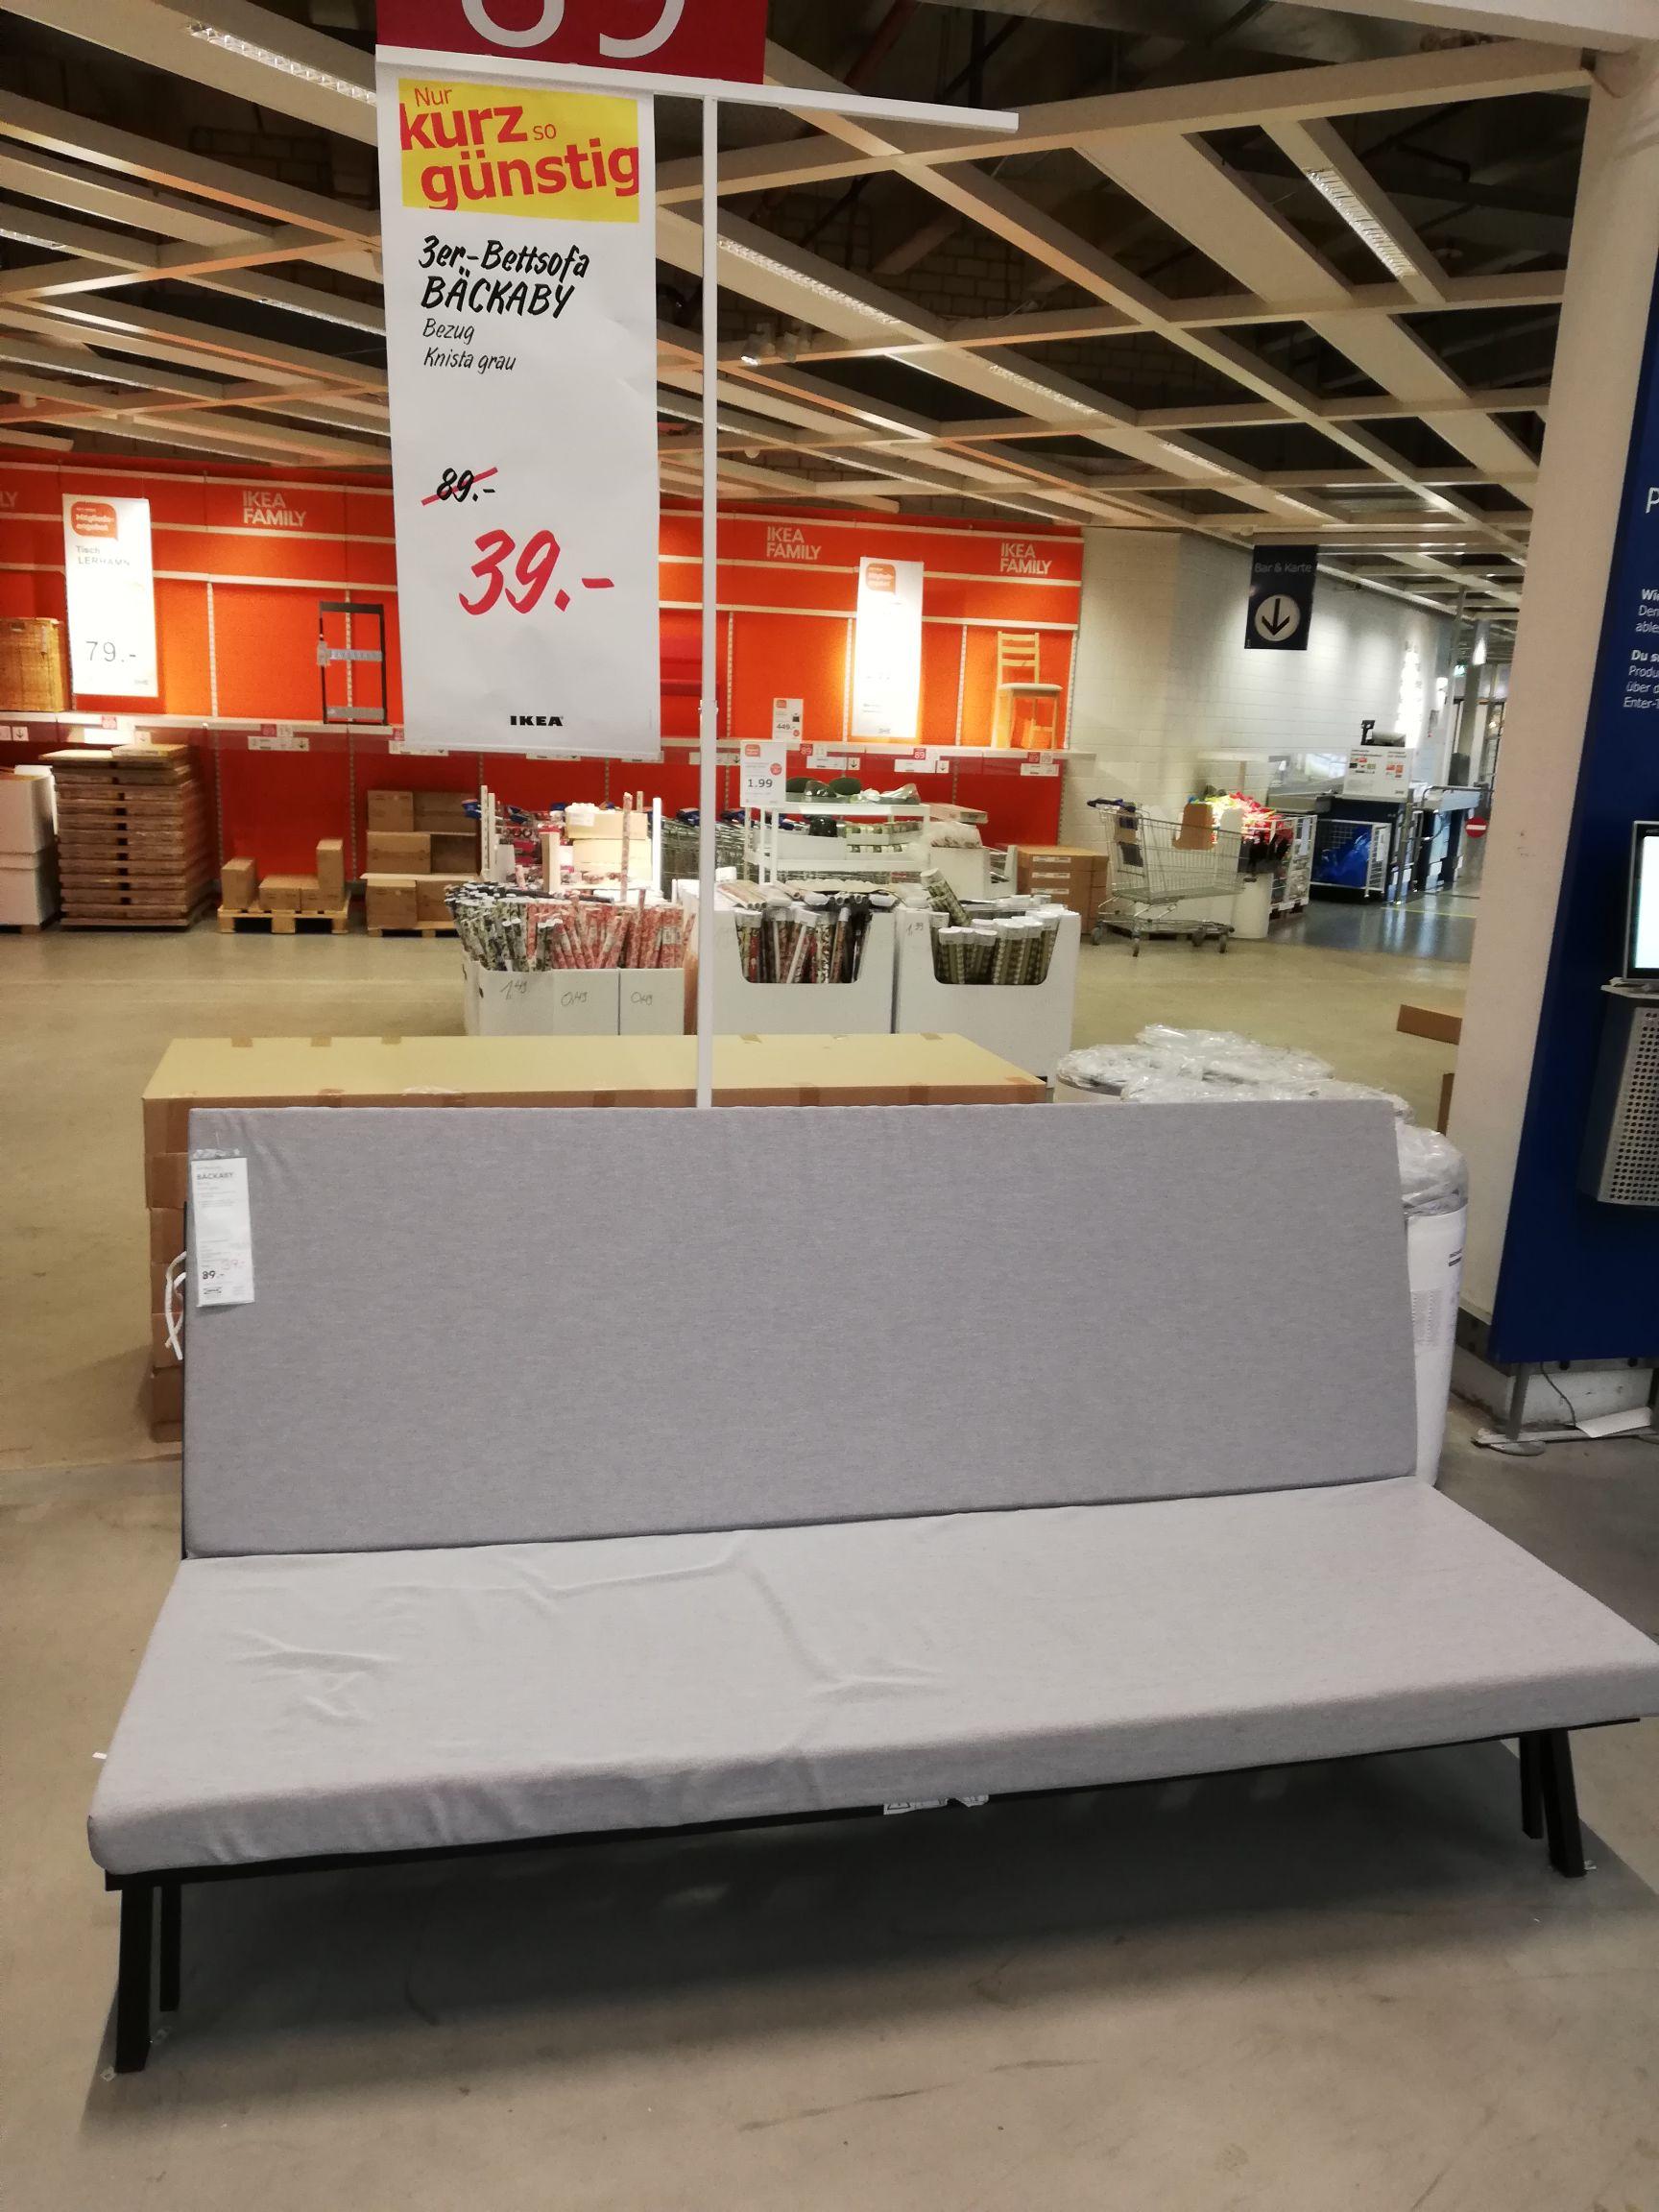 lokal braunschweig ikea 3er bettsofa. Black Bedroom Furniture Sets. Home Design Ideas